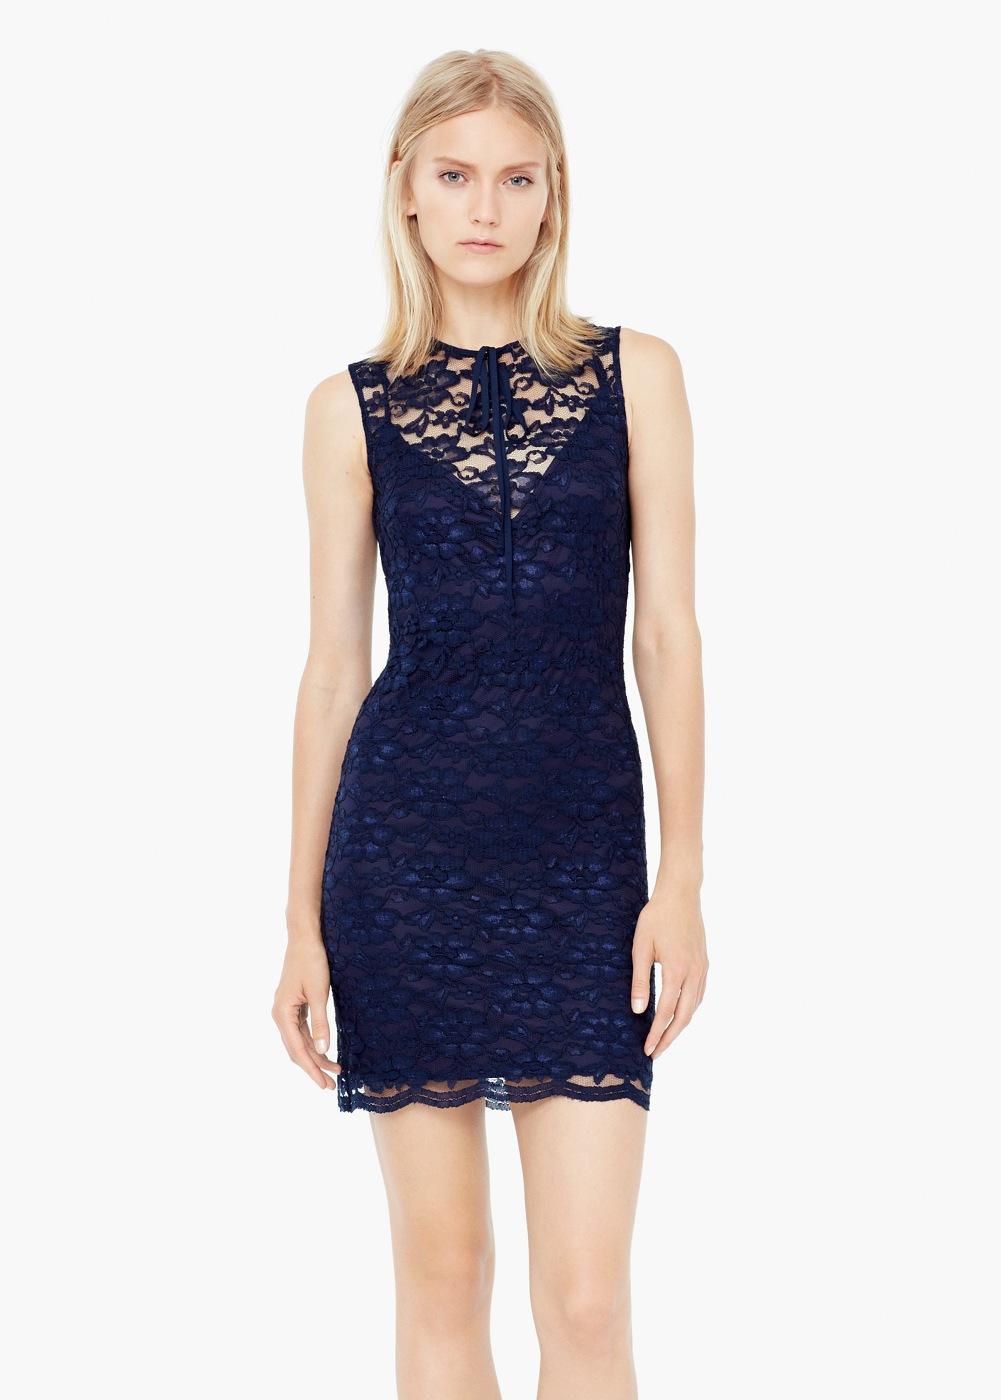 Mago dantel elbise modeli 2015